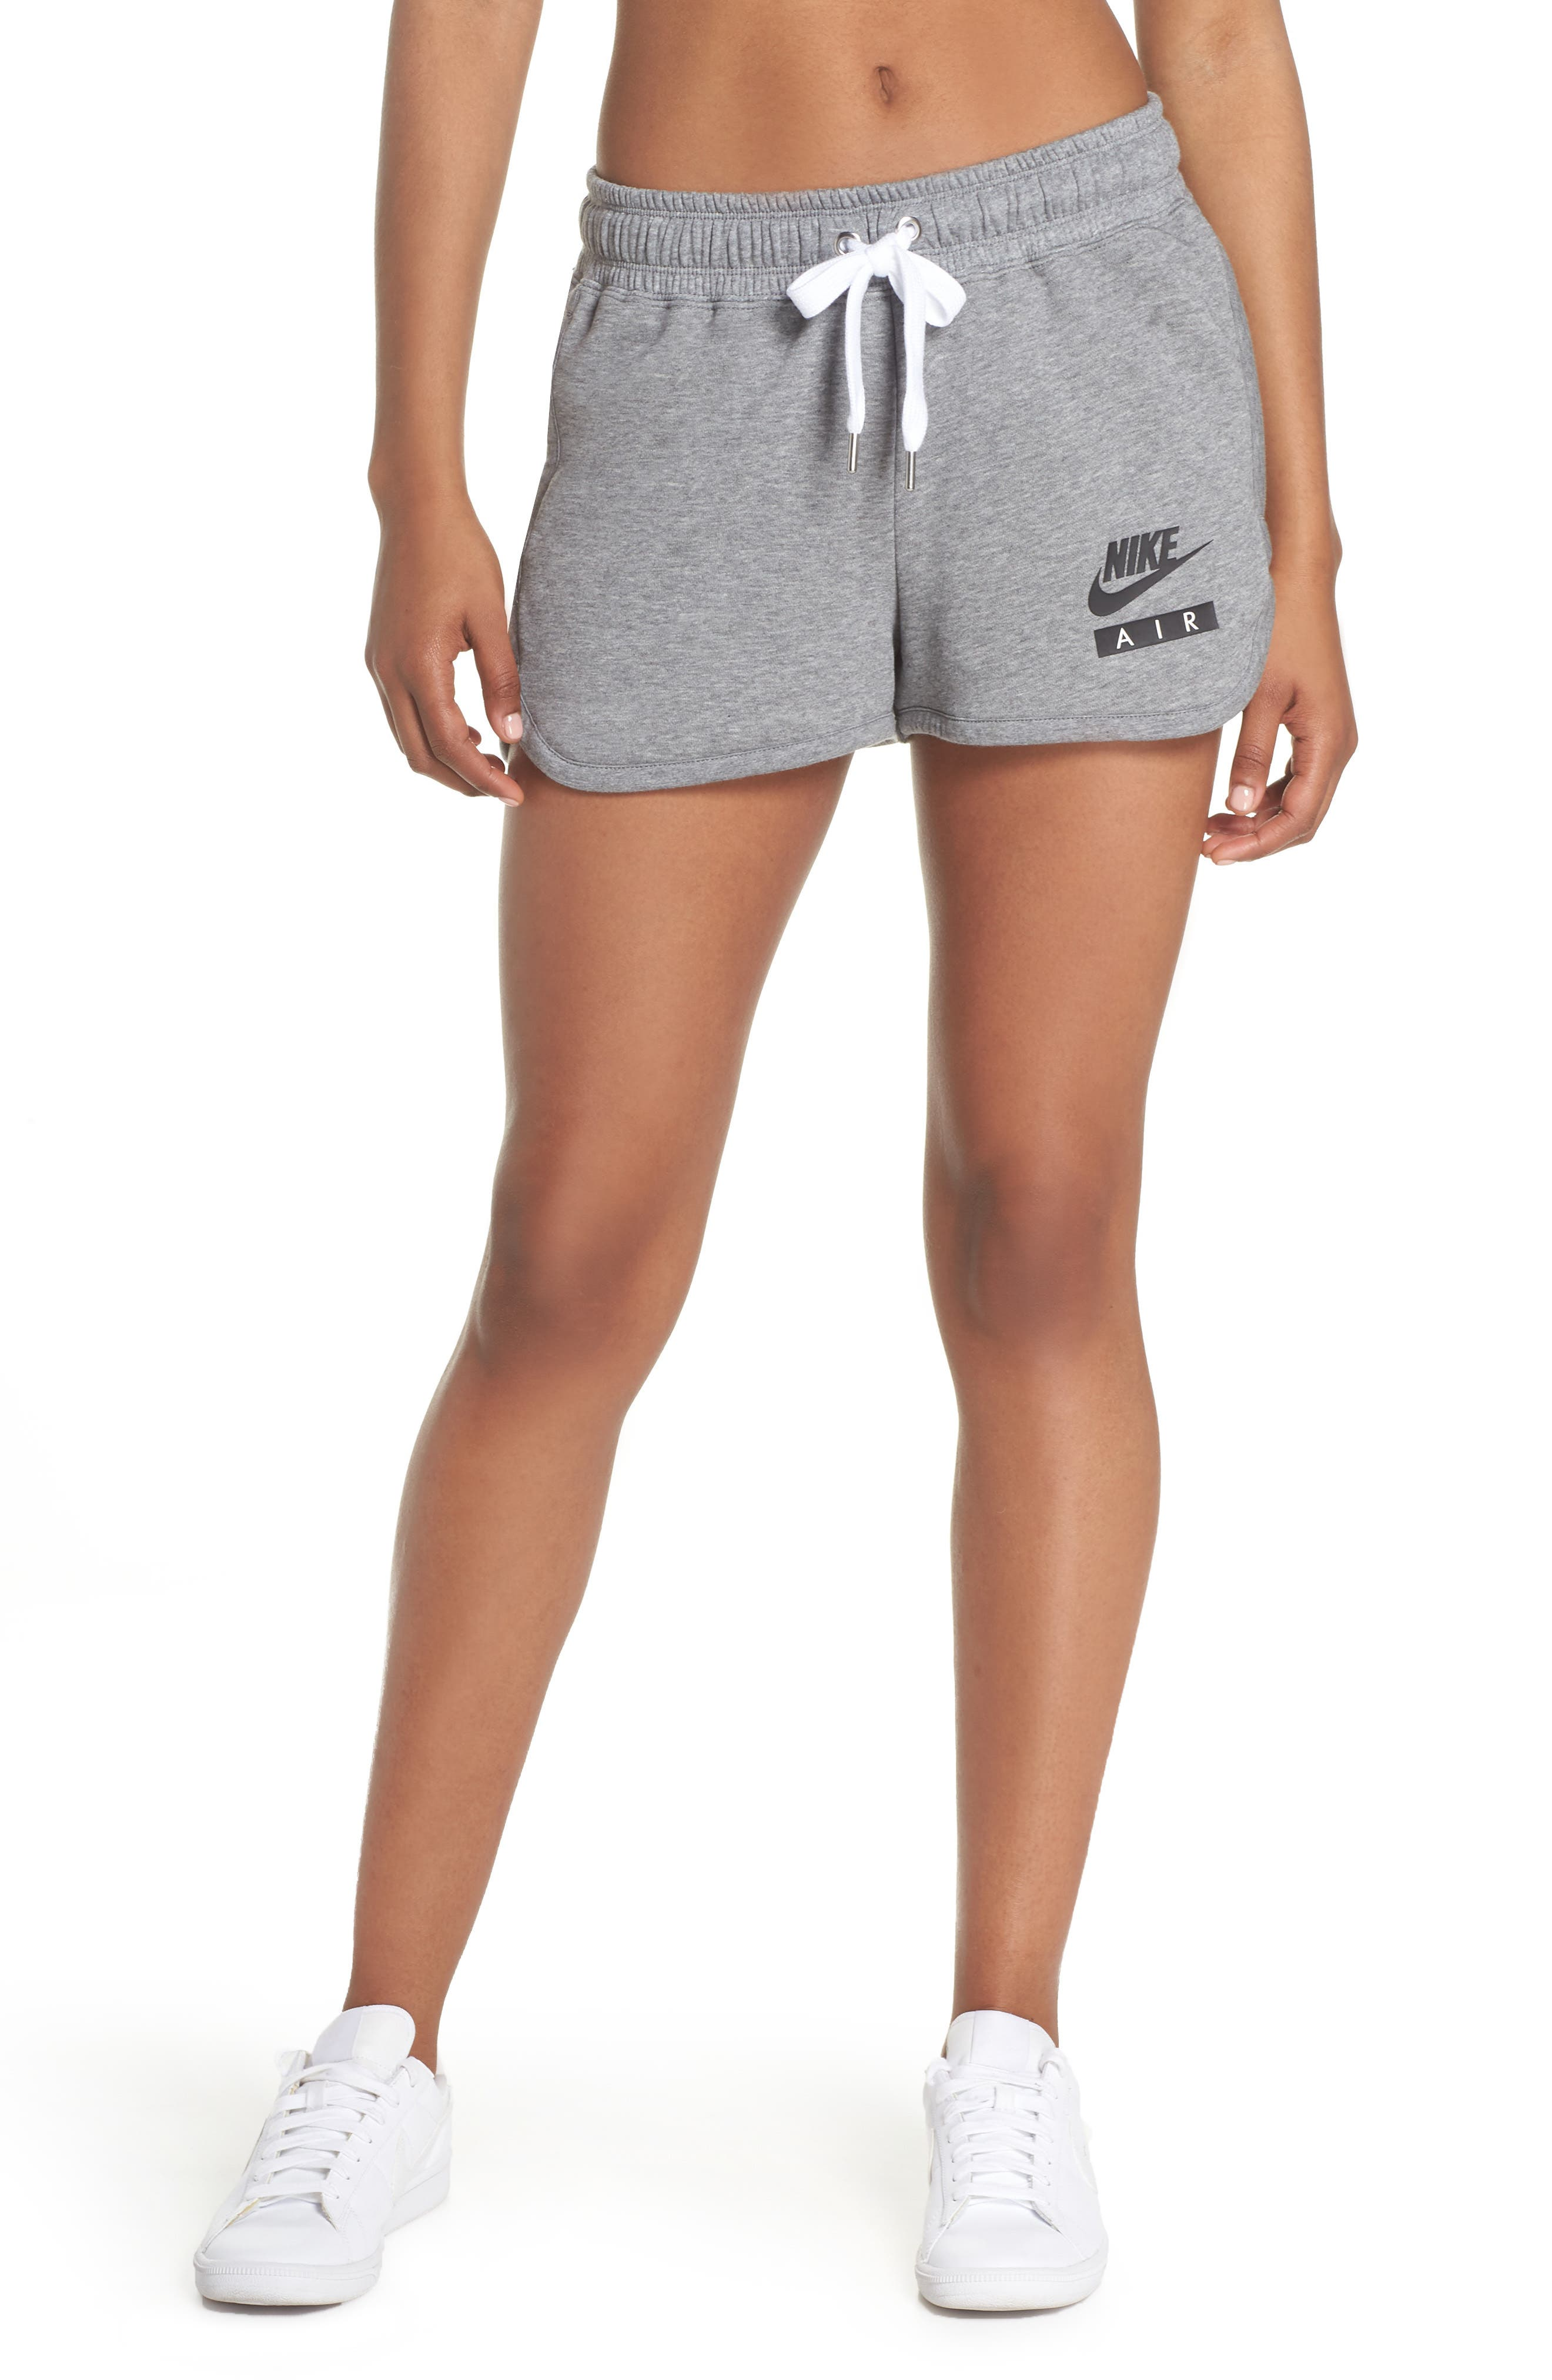 Sportswear Air Gym Shorts,                         Main,                         color, Carbon Heather/ White/ Black